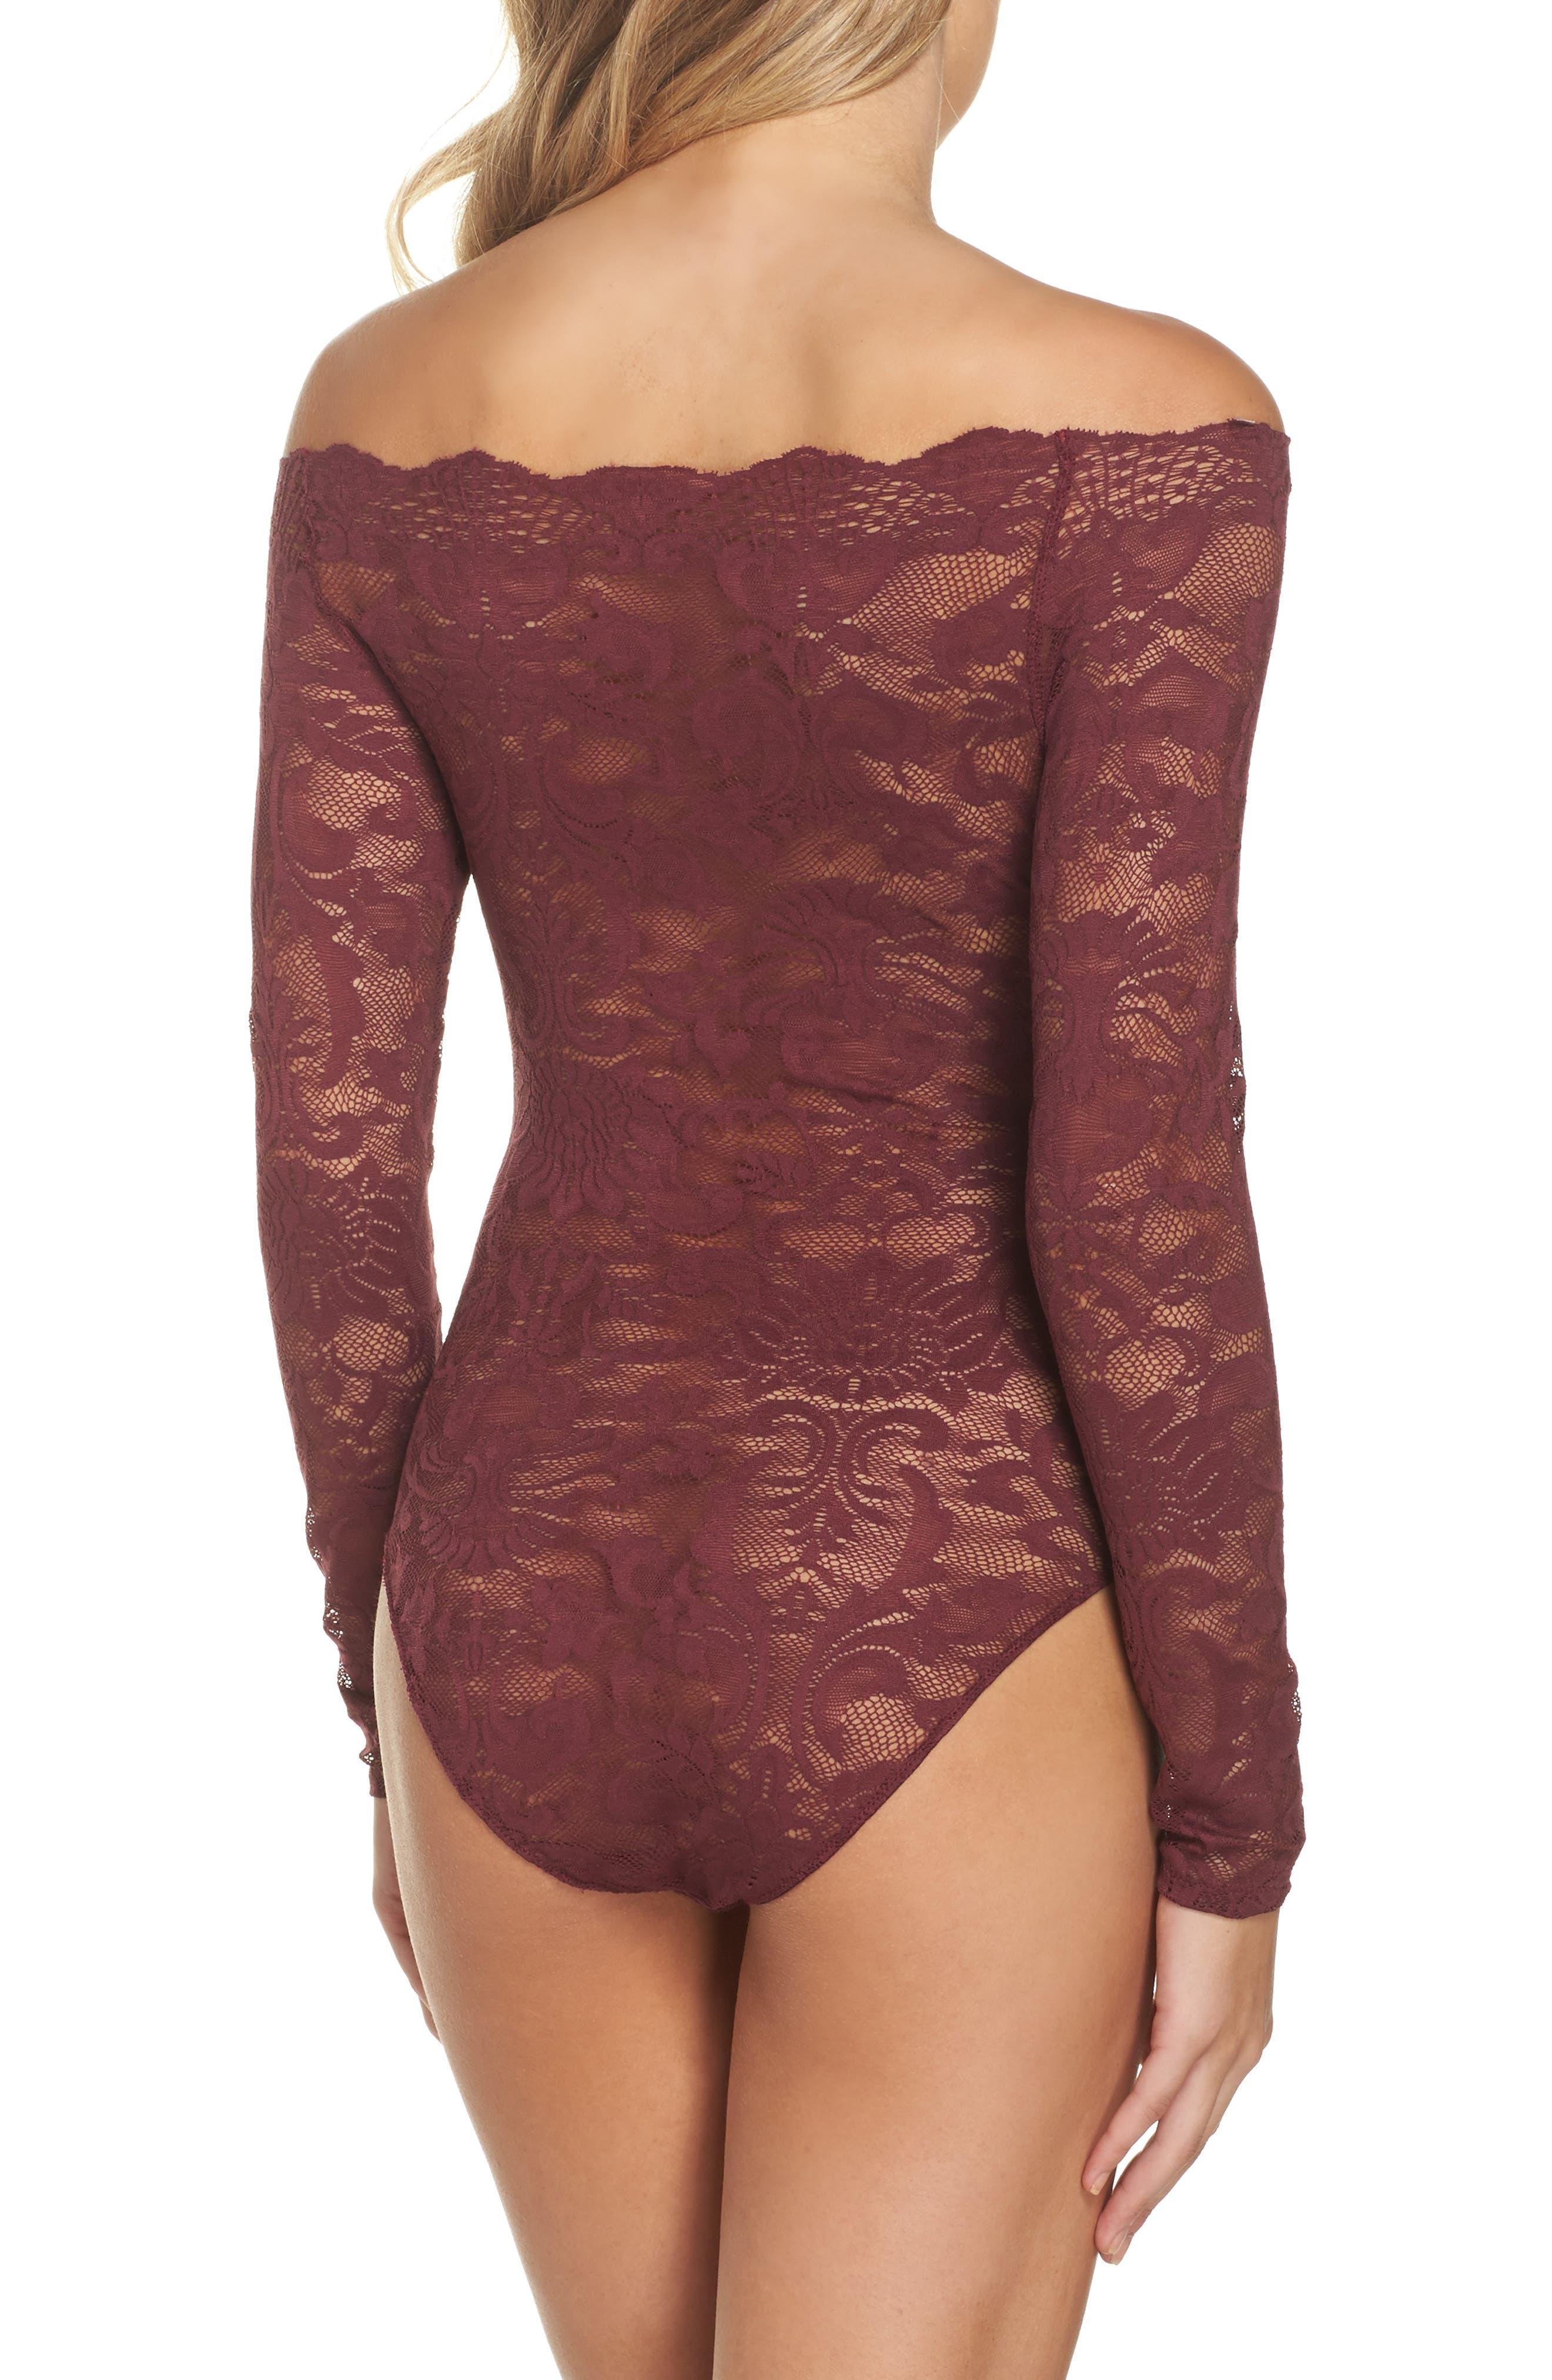 Eliza Off the Shoulder Lace Bodysuit,                             Alternate thumbnail 2, color,                             Tawny Port